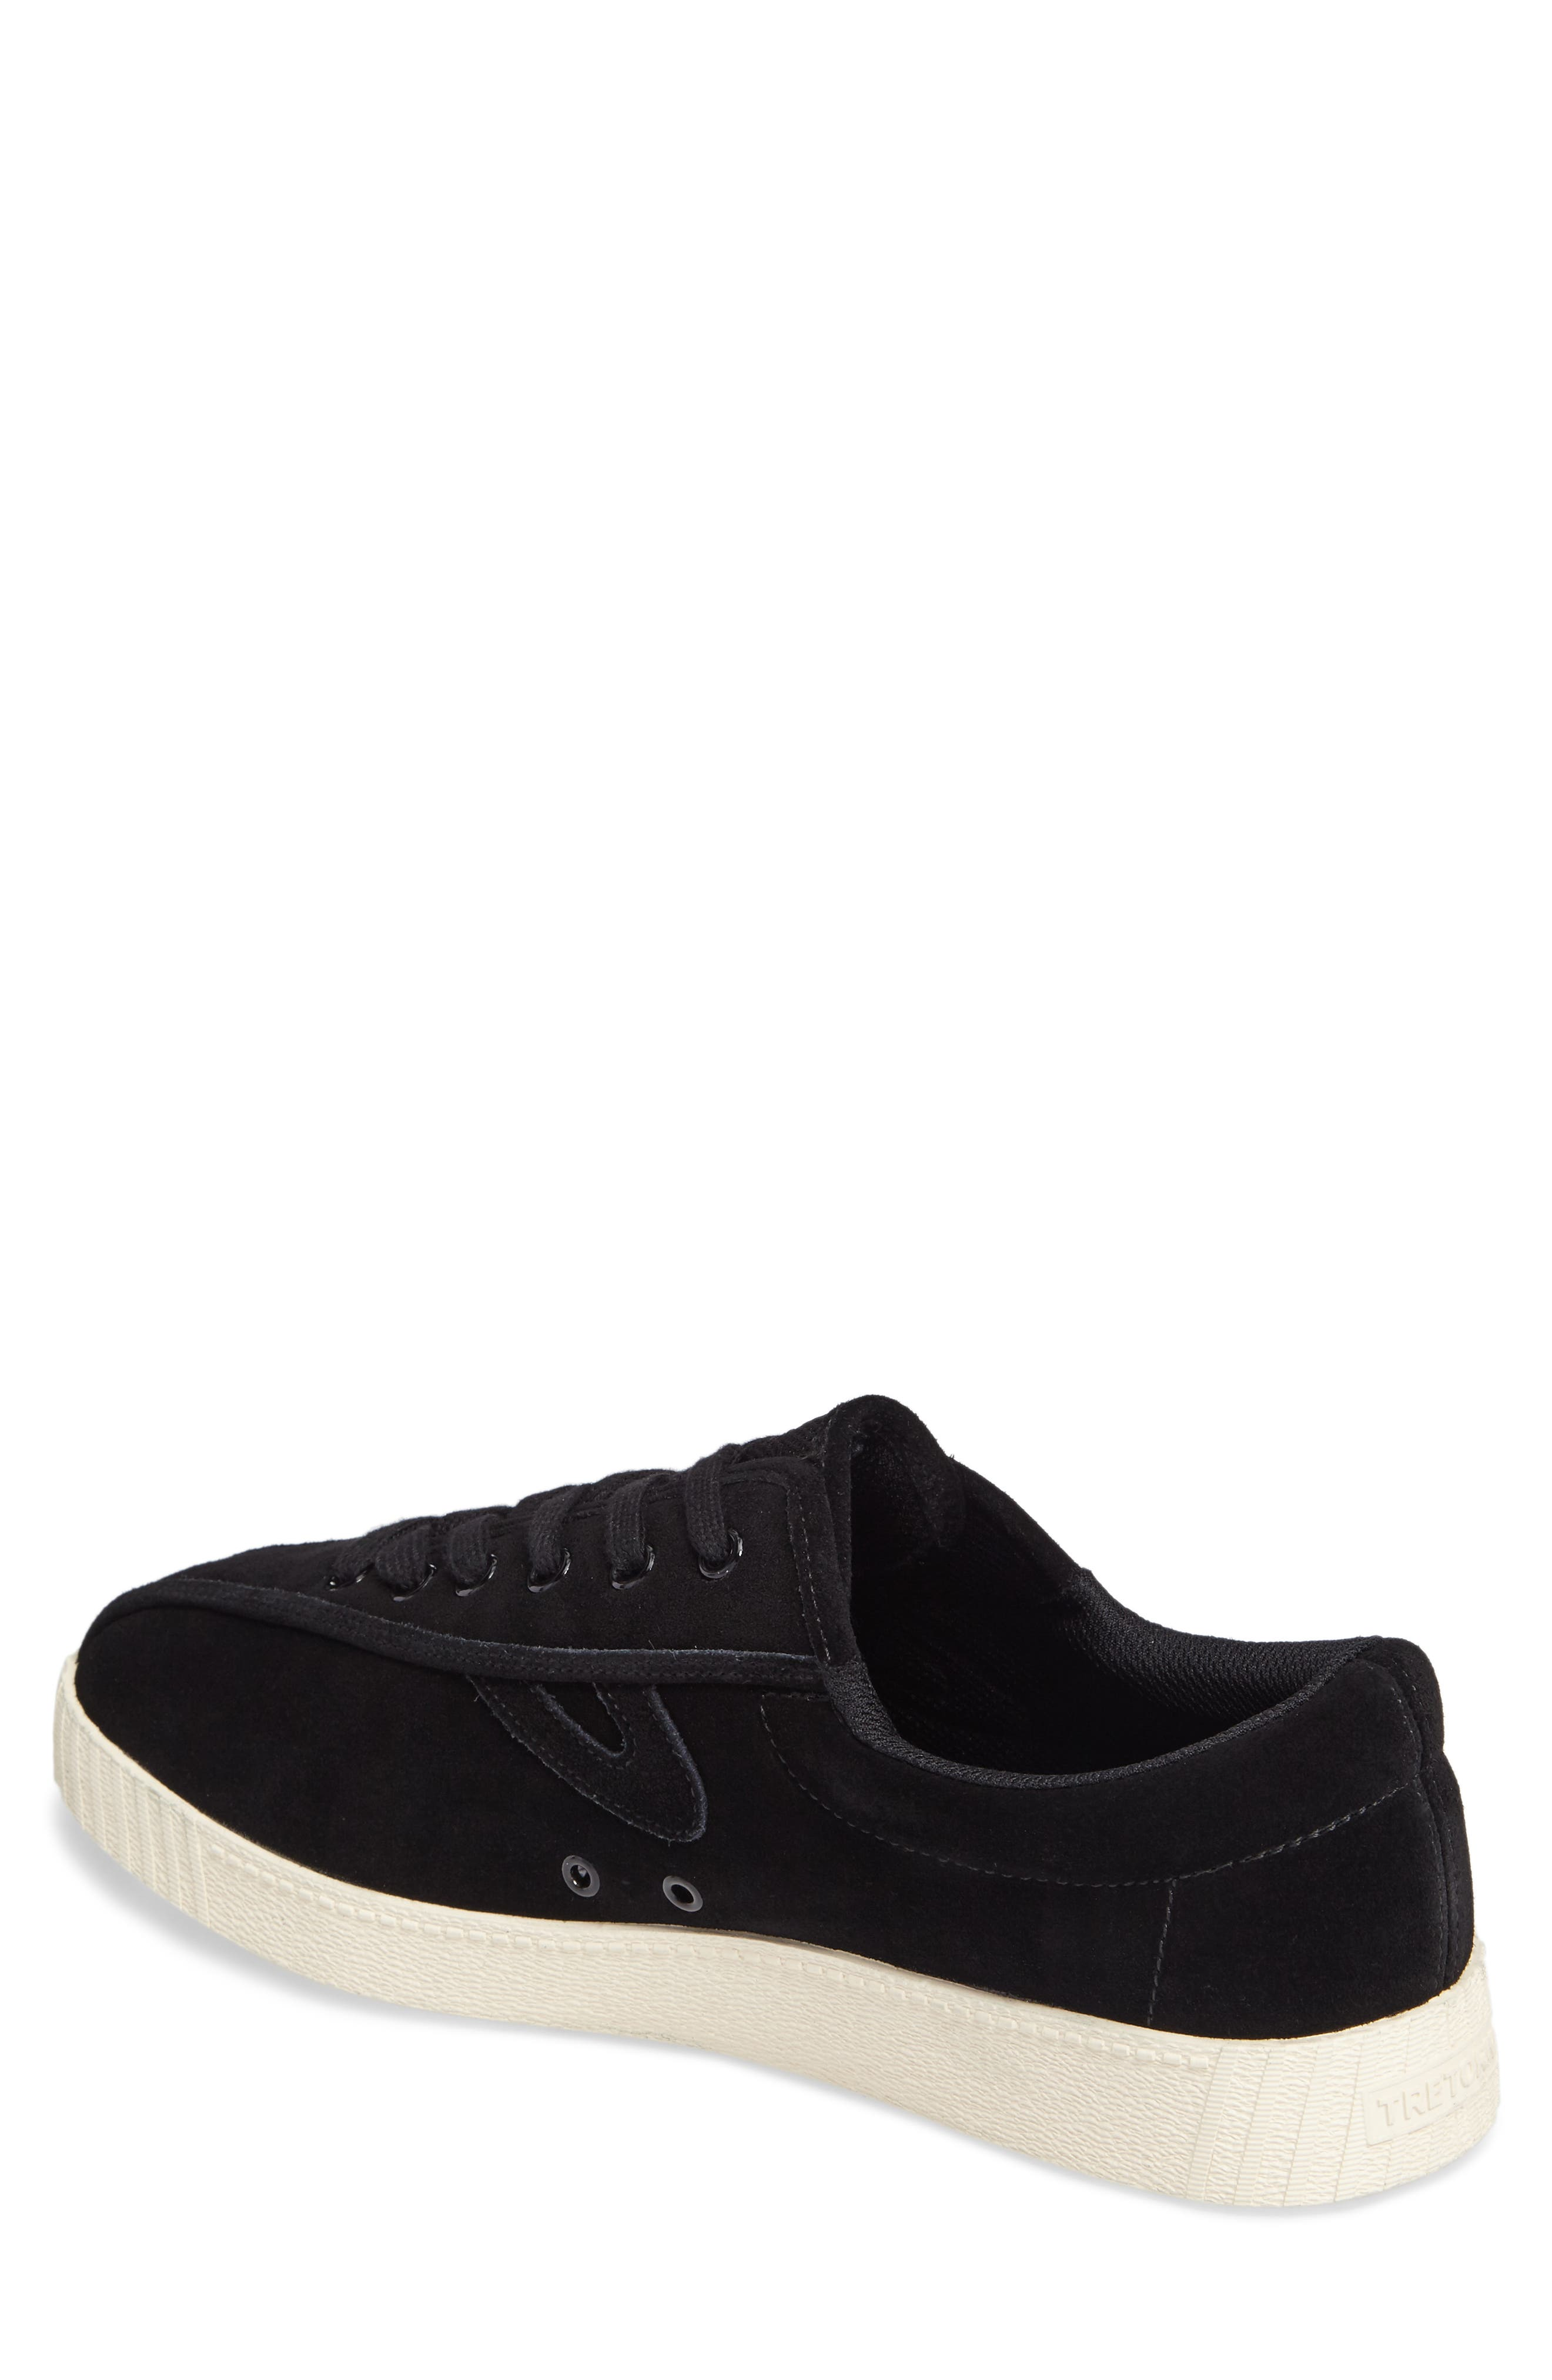 Nylite 16 Sneaker,                             Alternate thumbnail 2, color,                             BLACK/ BLACK SUEDE